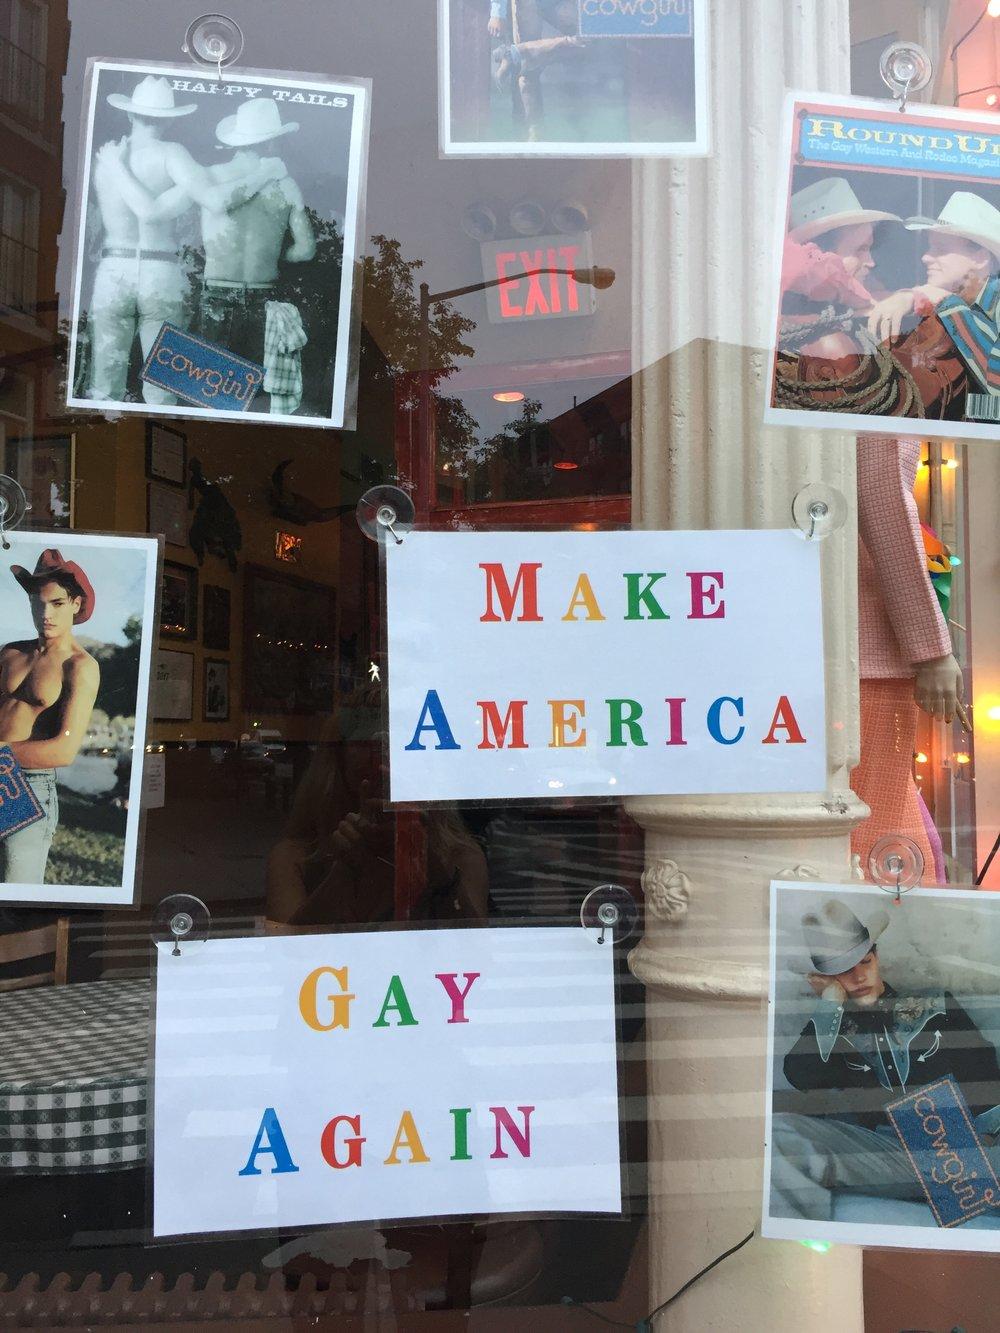 Make America Gay Again.JPG